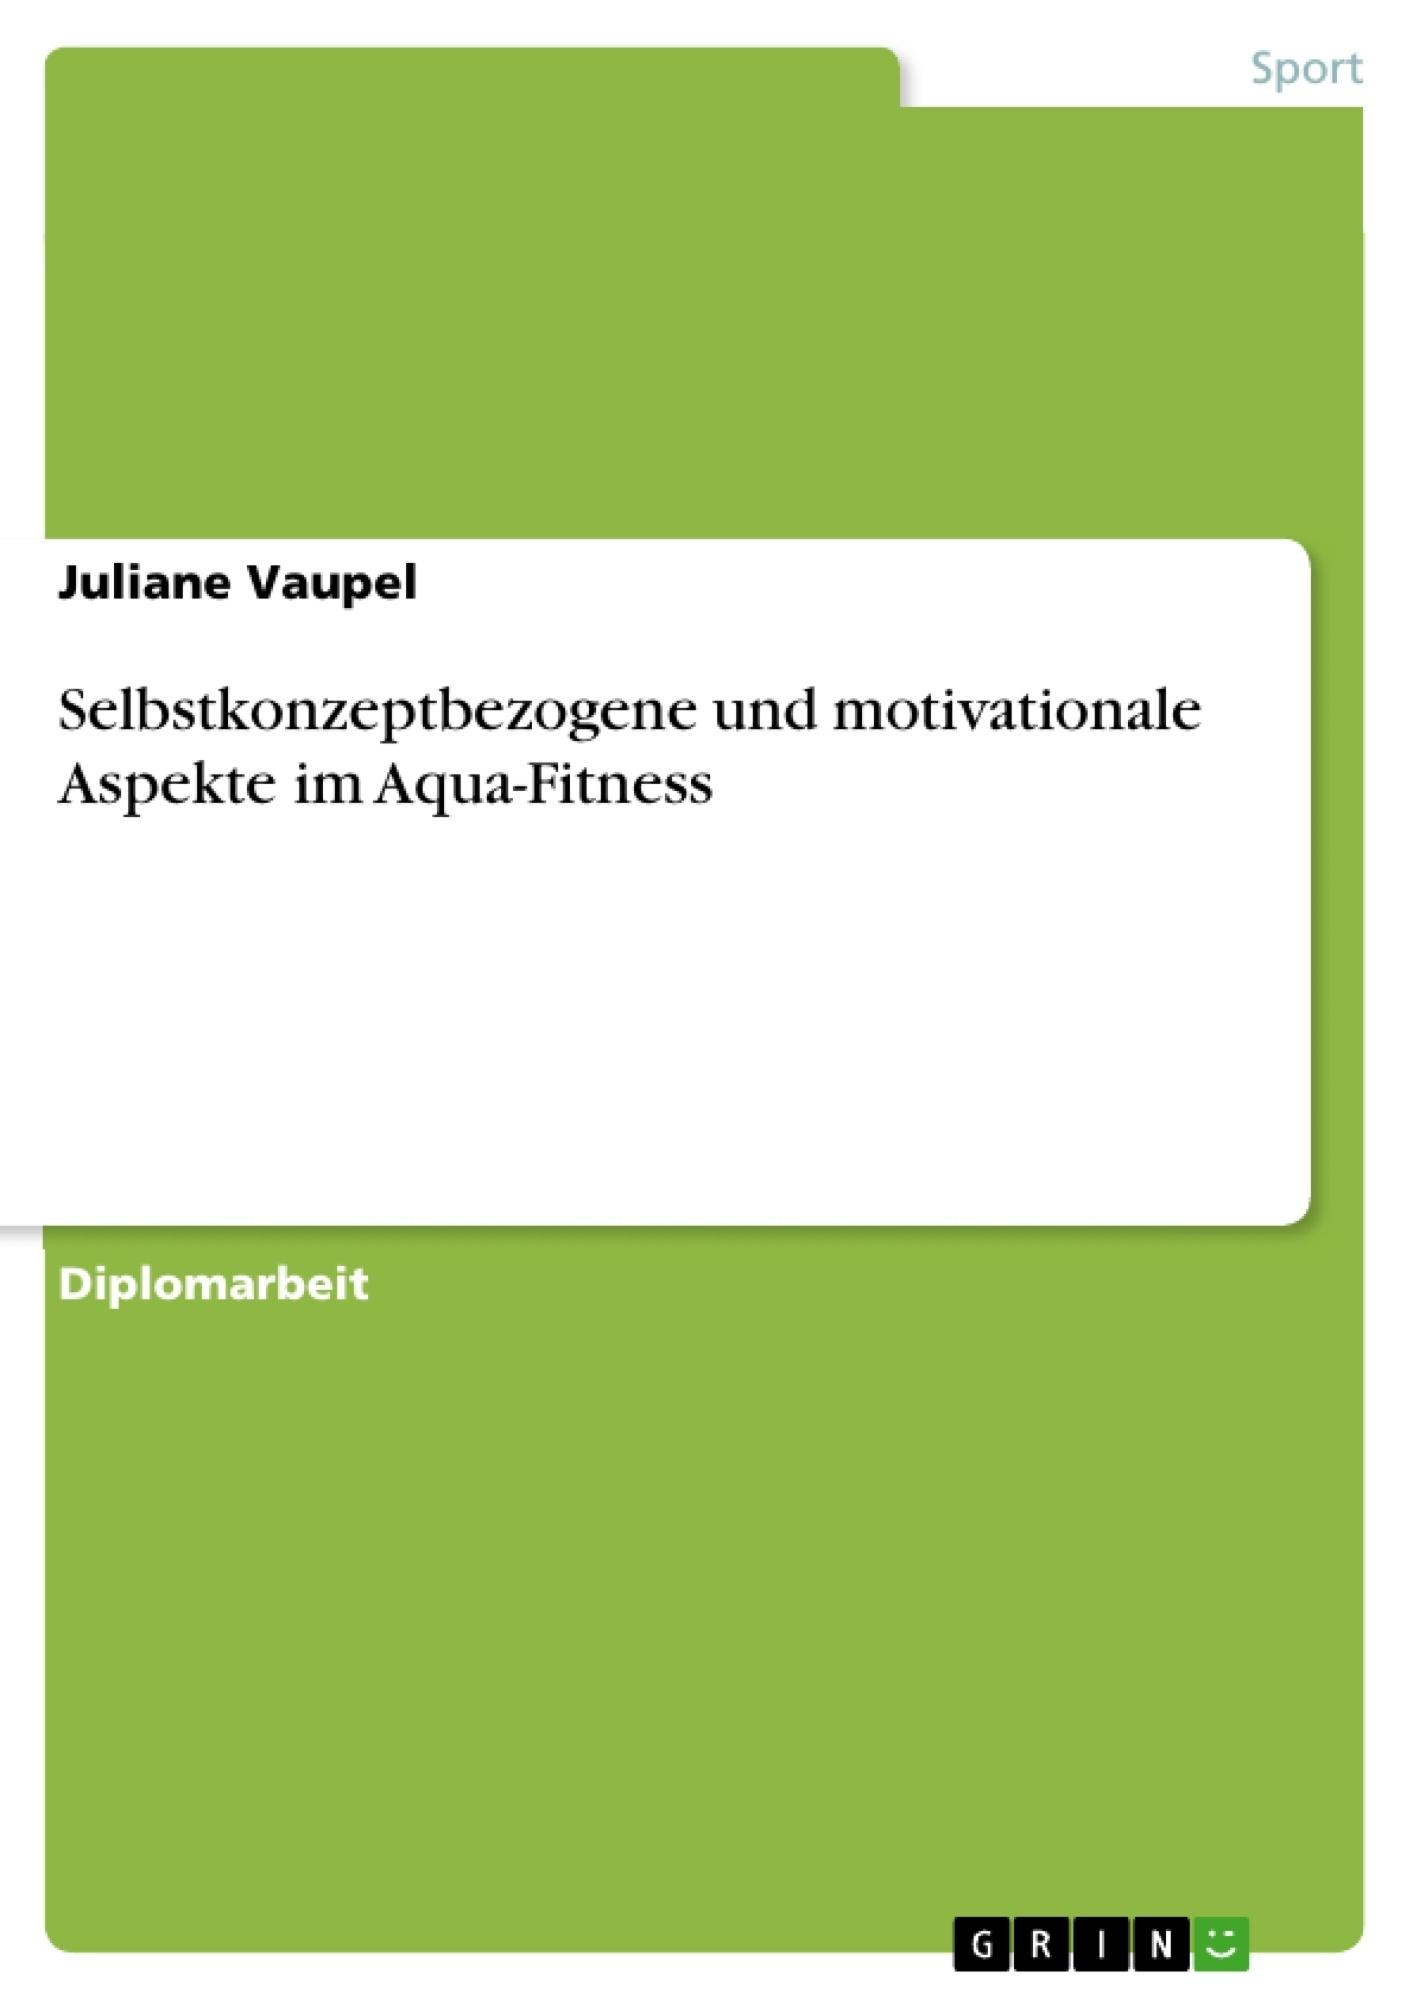 Titel: Selbstkonzeptbezogene und motivationale Aspekte im Aqua-Fitness